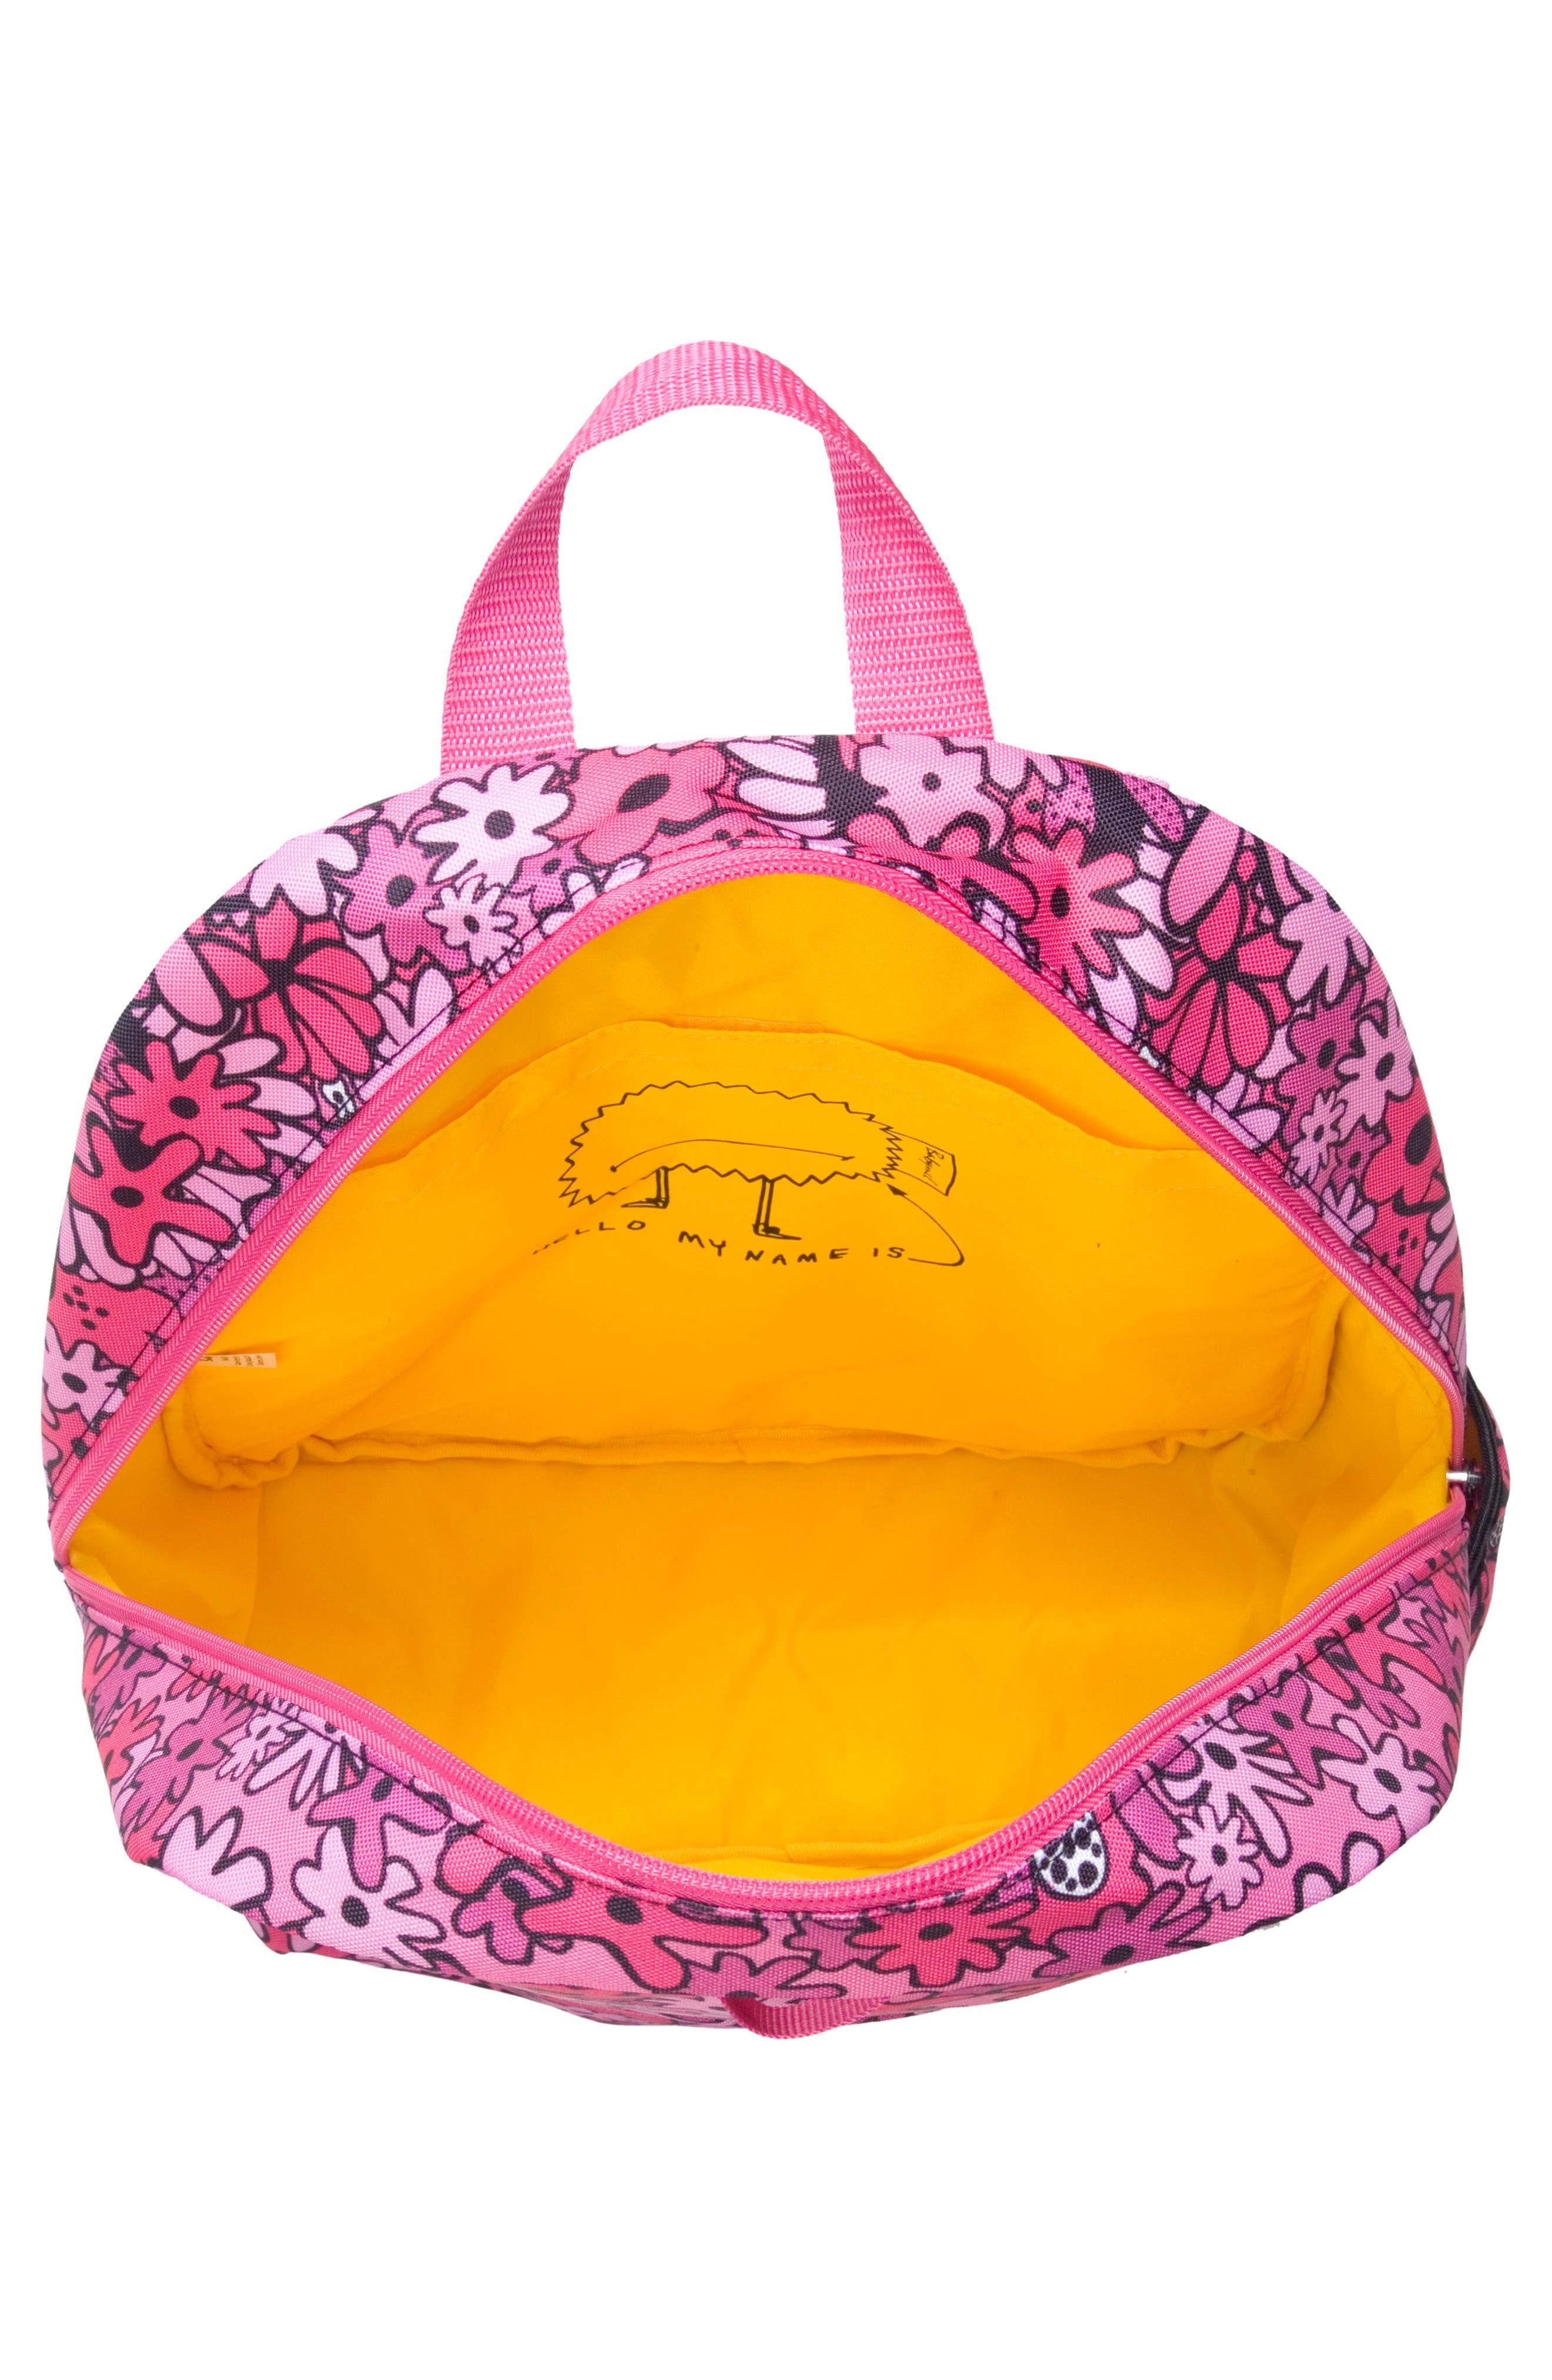 Zip & Zoe Floral Junior Backpack,                             Alternate thumbnail 6, color,                             Floral Pink